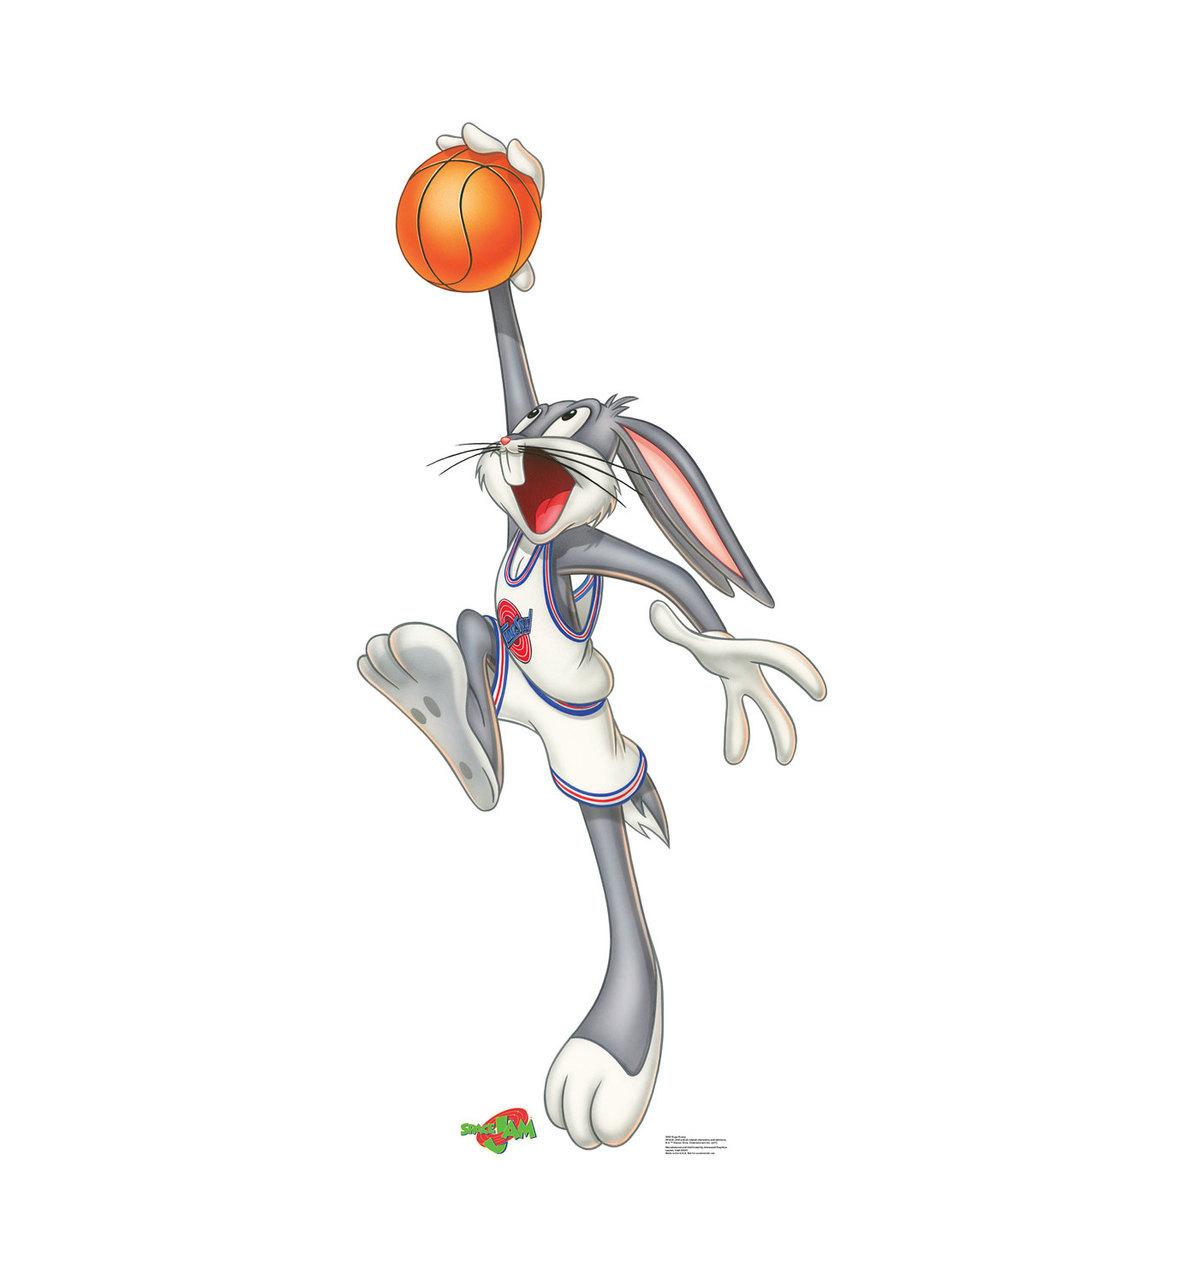 Su Bugs Bunny Space Jam Cardboard Standup